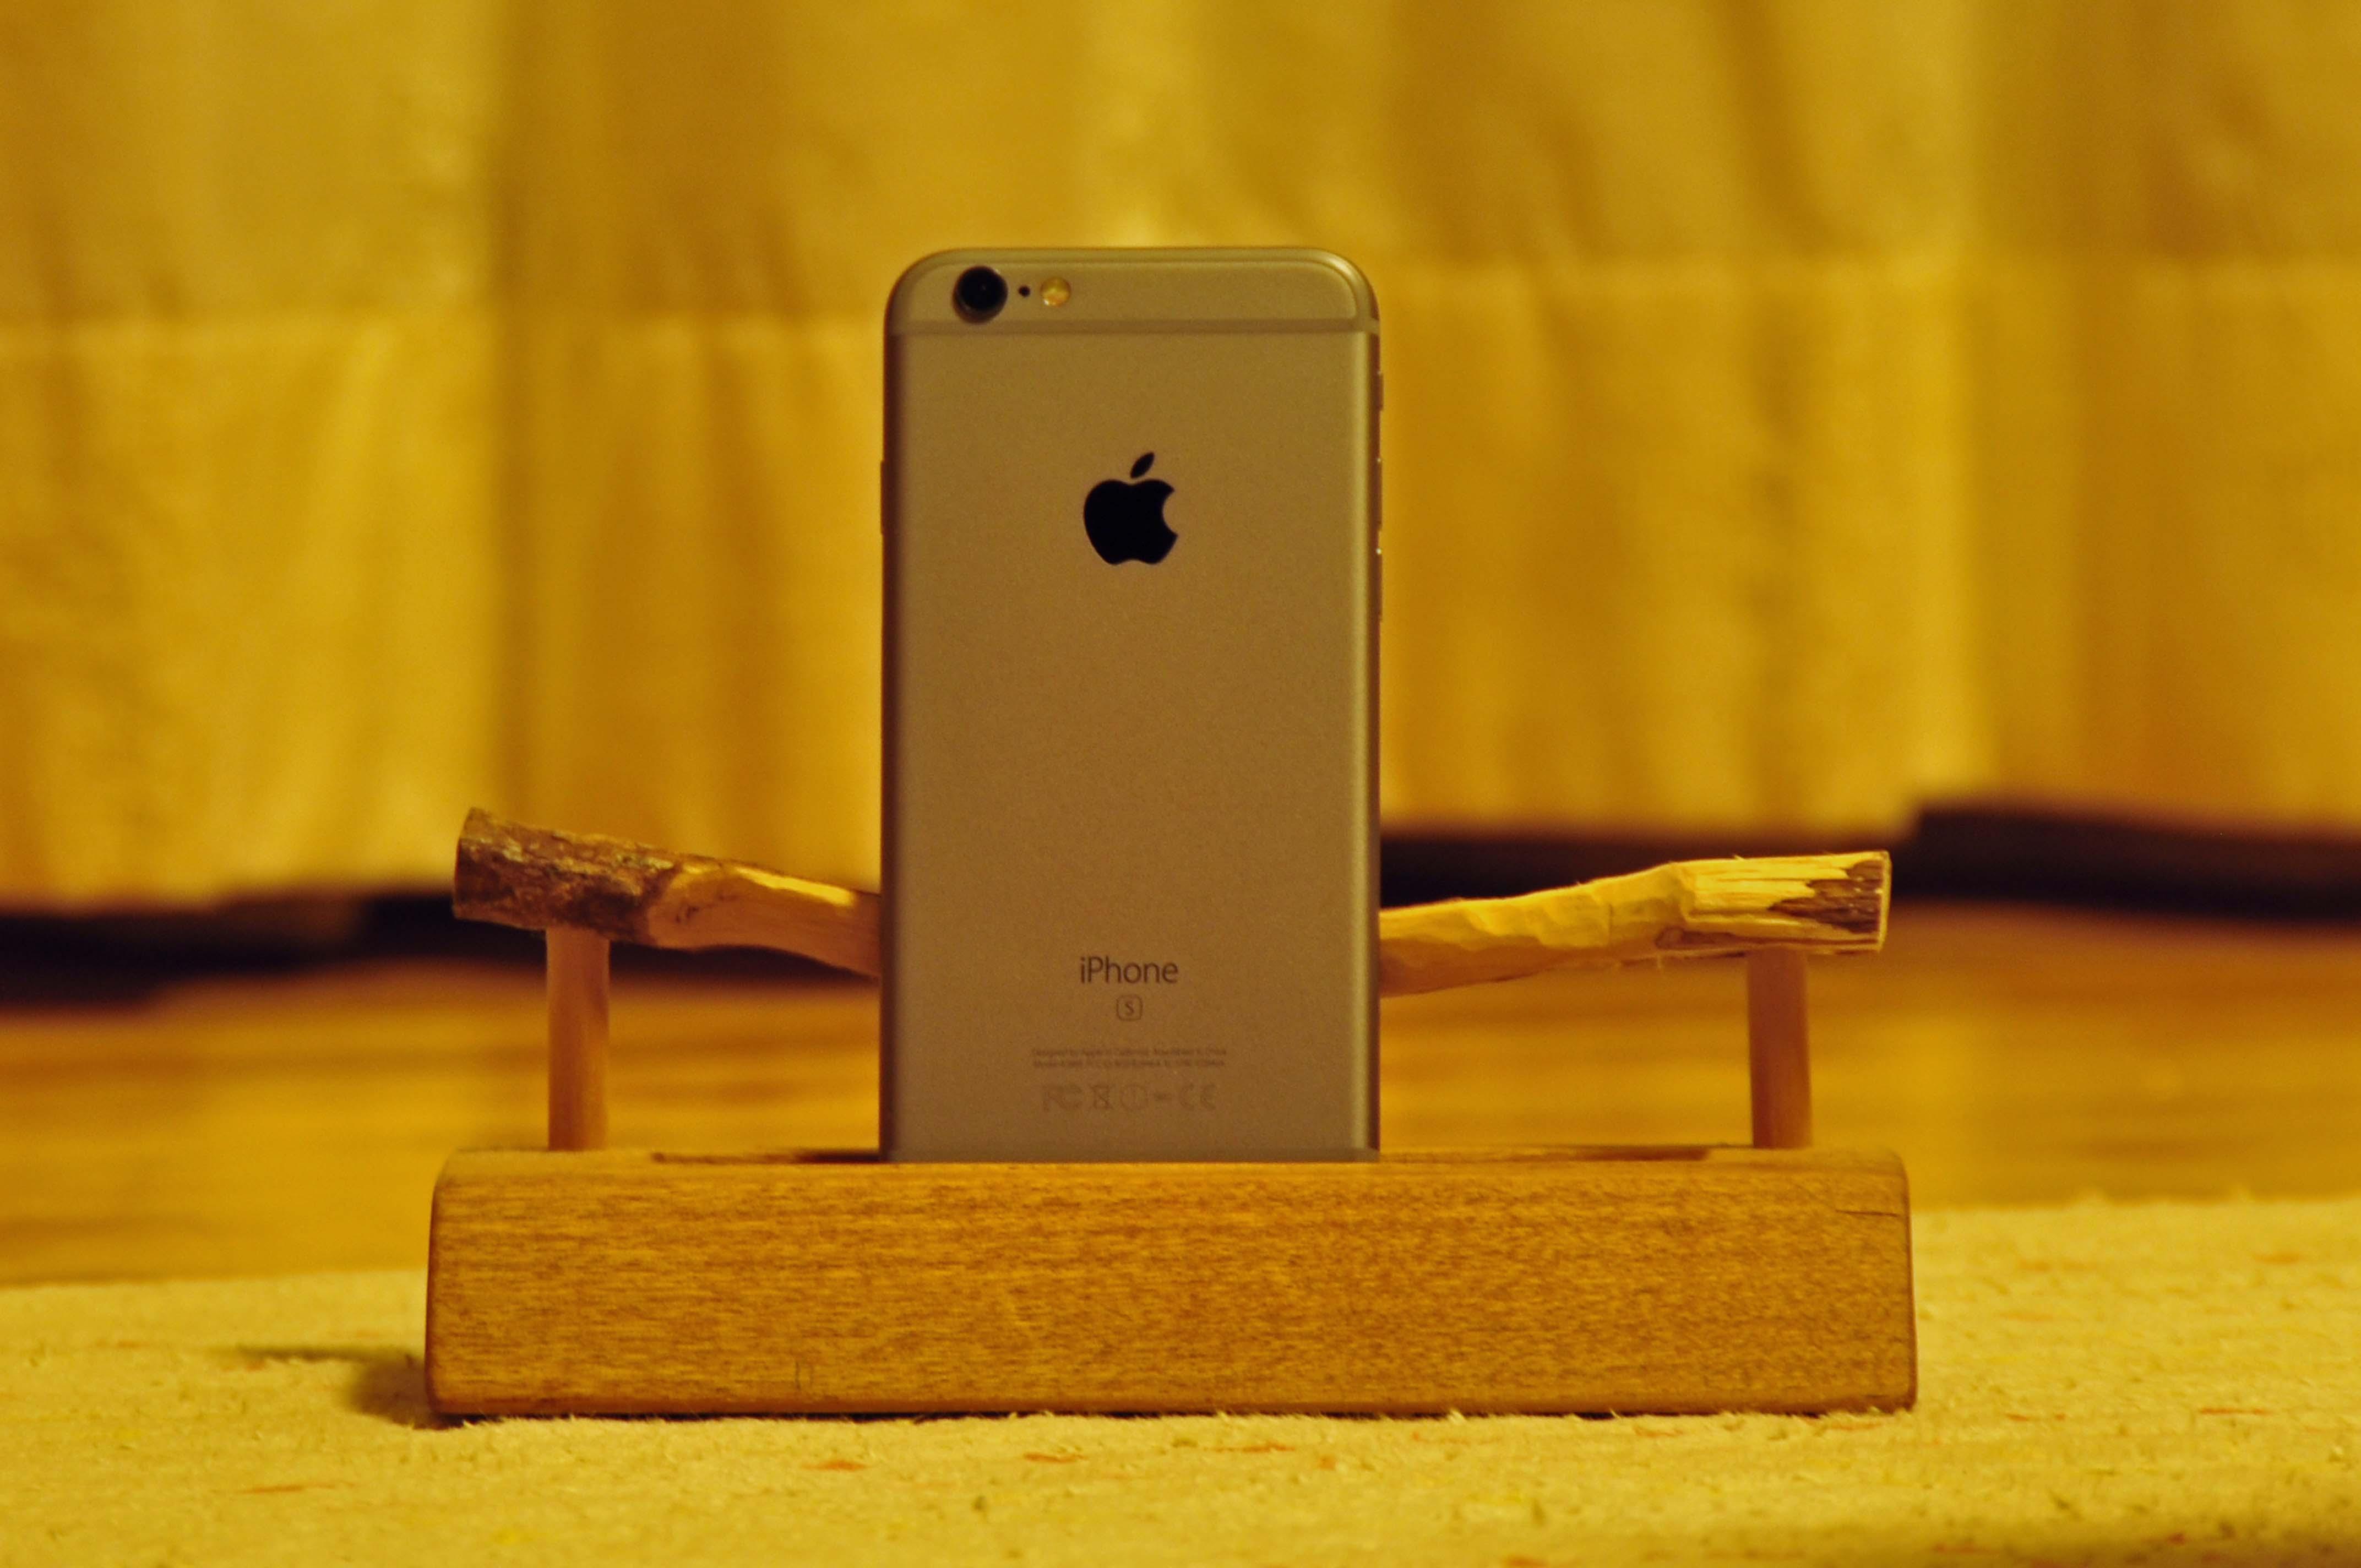 iphone6s 木工スタンド